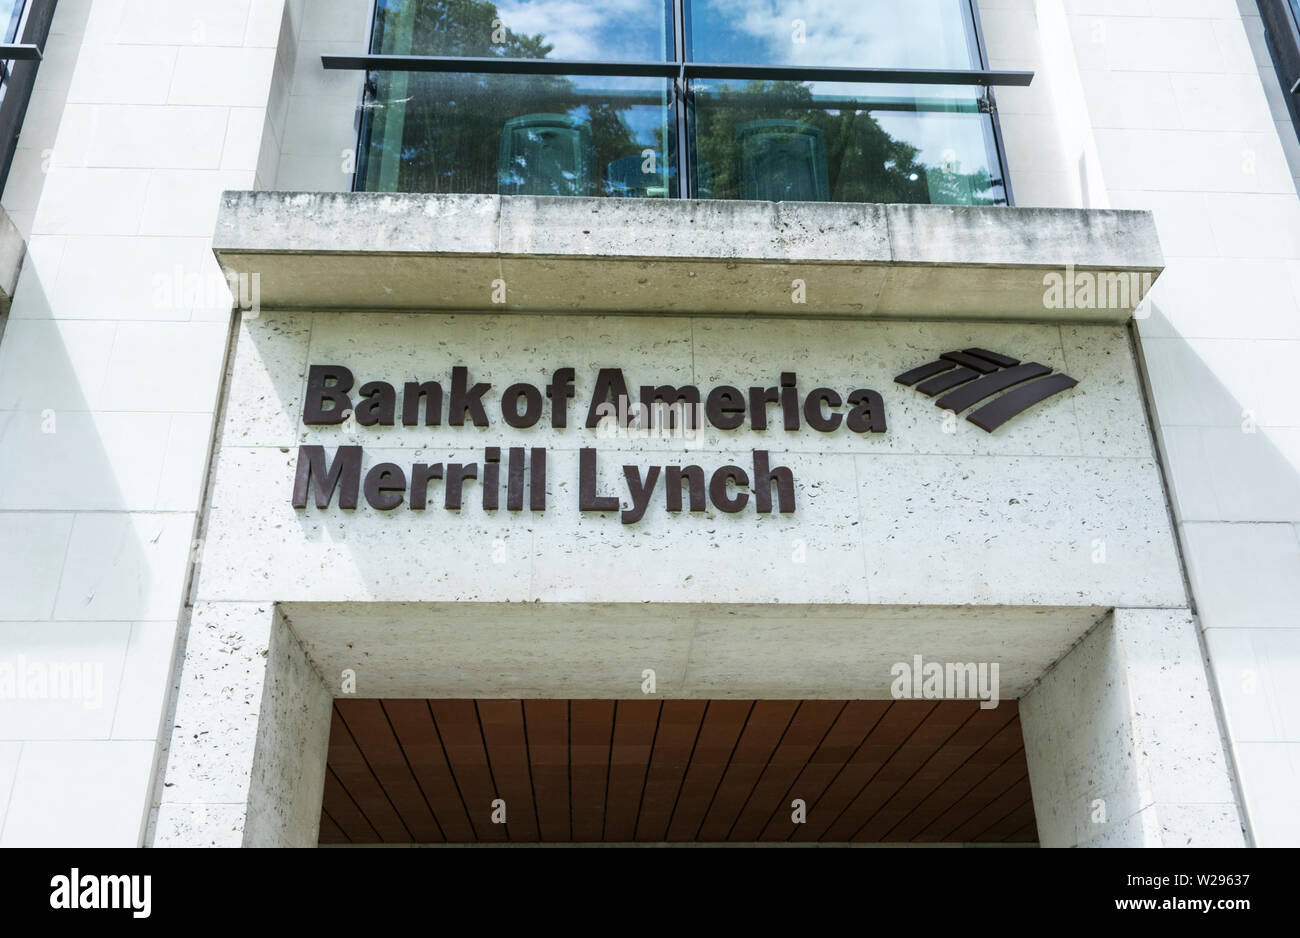 Bank of America, Merrill Lynch, King Edward Street, Farringdon, London EC1, England, UK Stock Photo